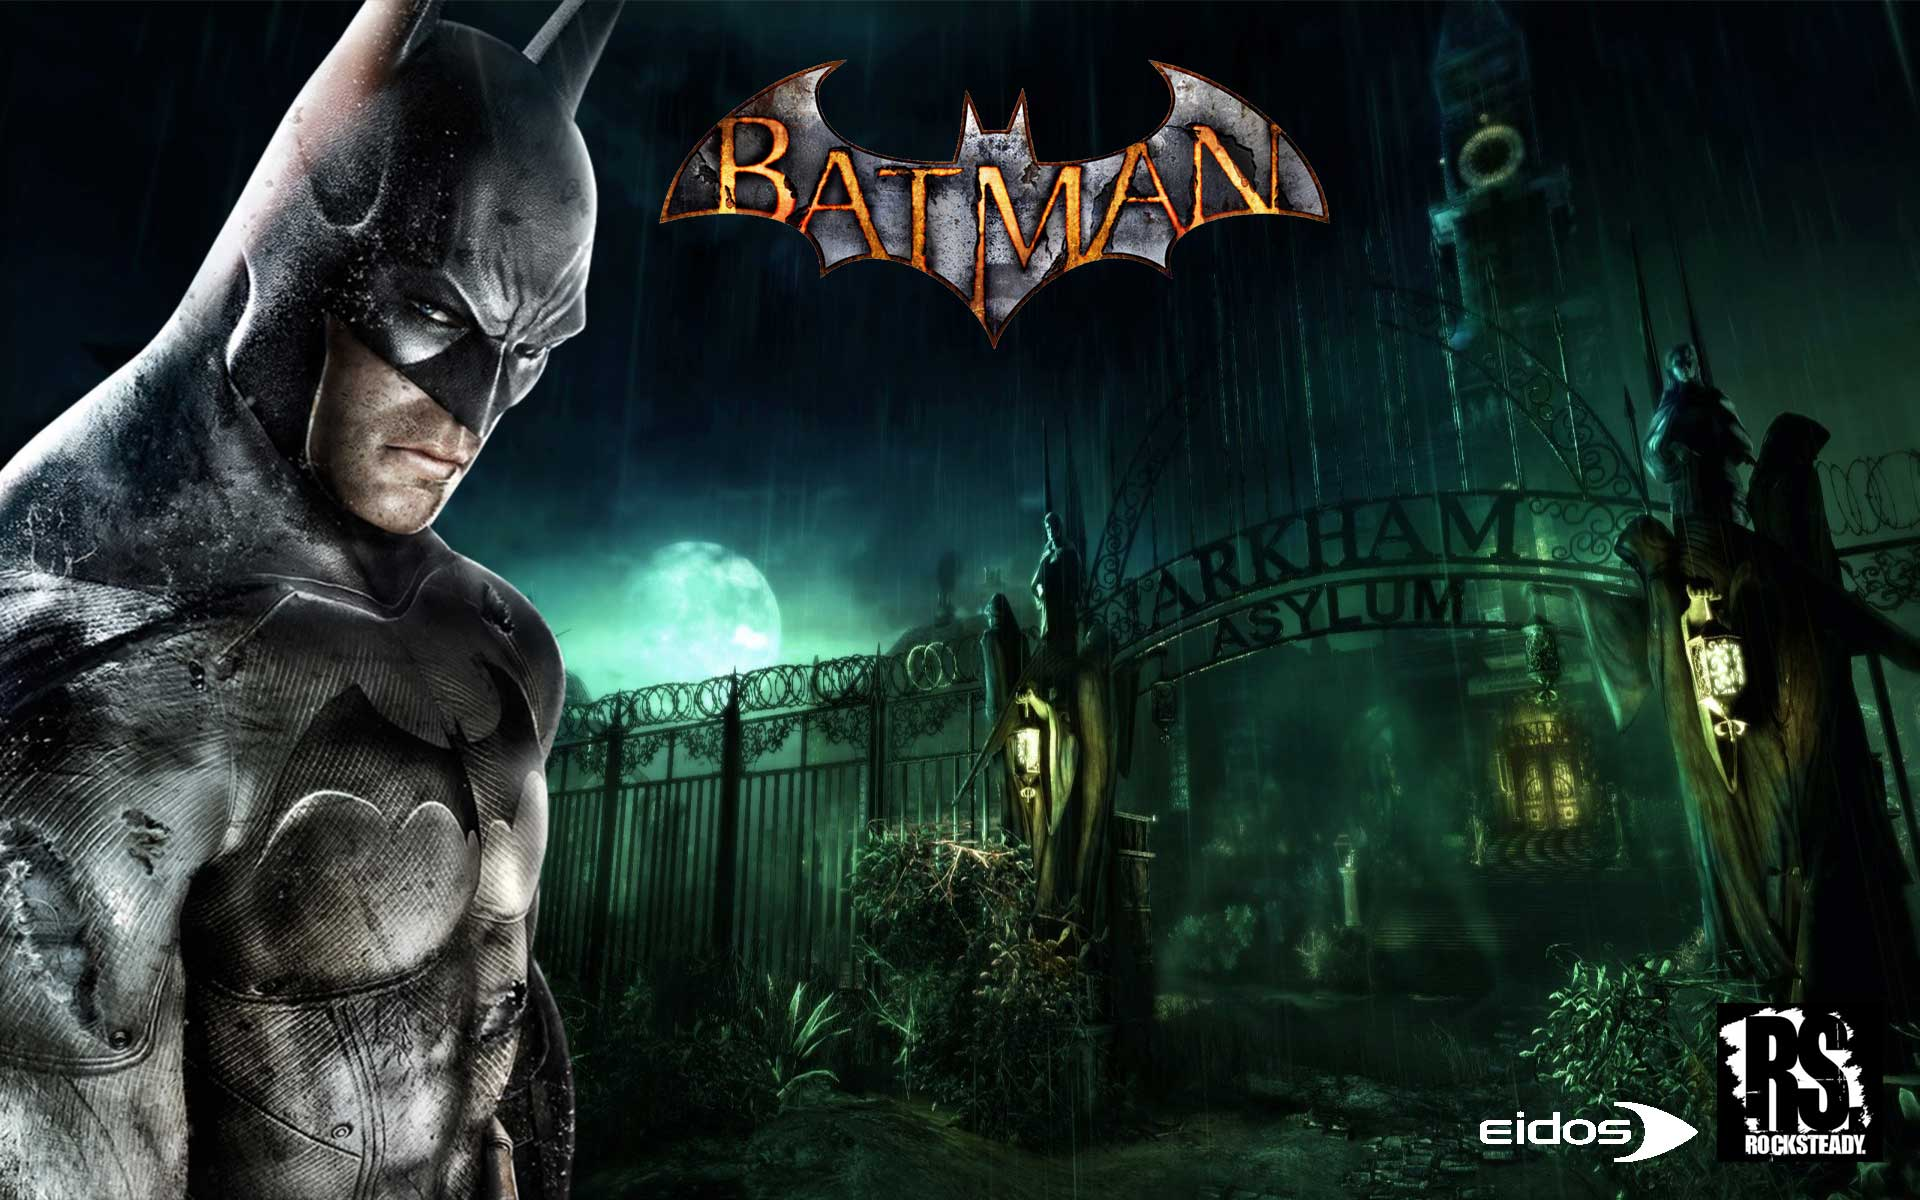 Batman Arkham Asylum Wallpapers 4110 Hd Wallpapers in Games   Imagesci 1920x1200